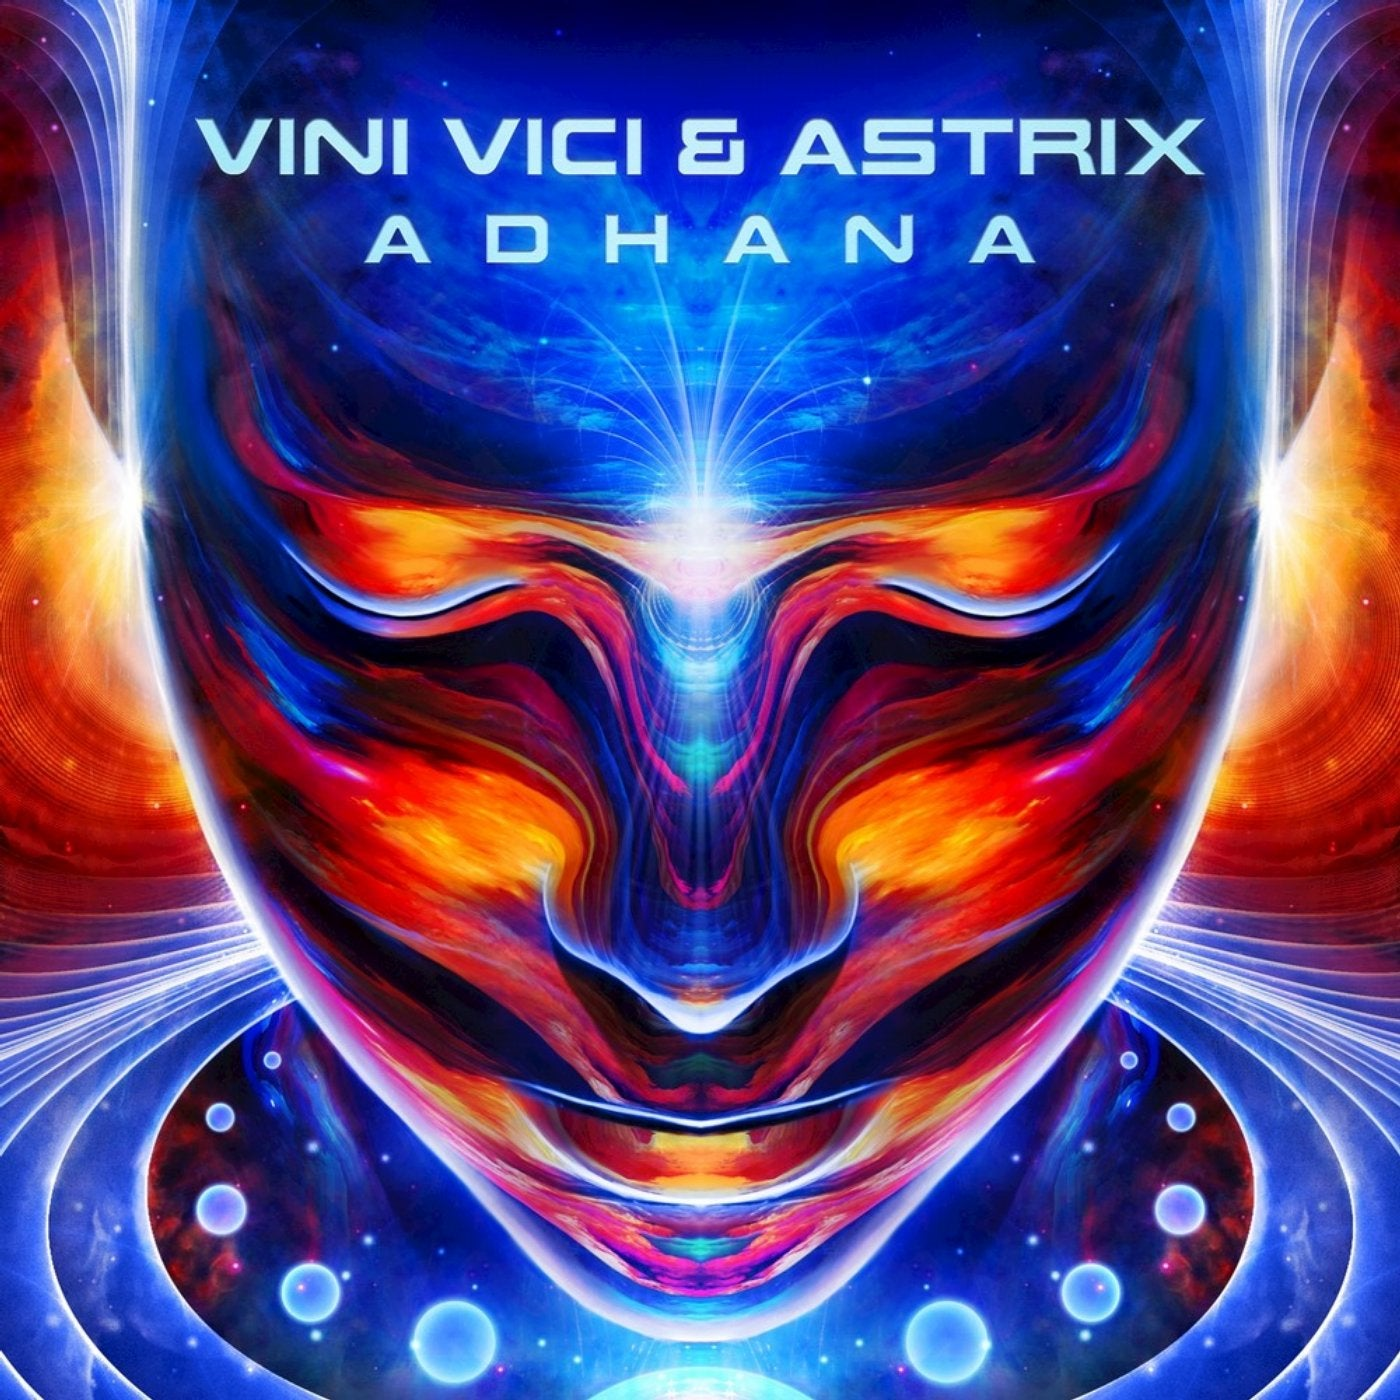 Adhana (Original Mix)